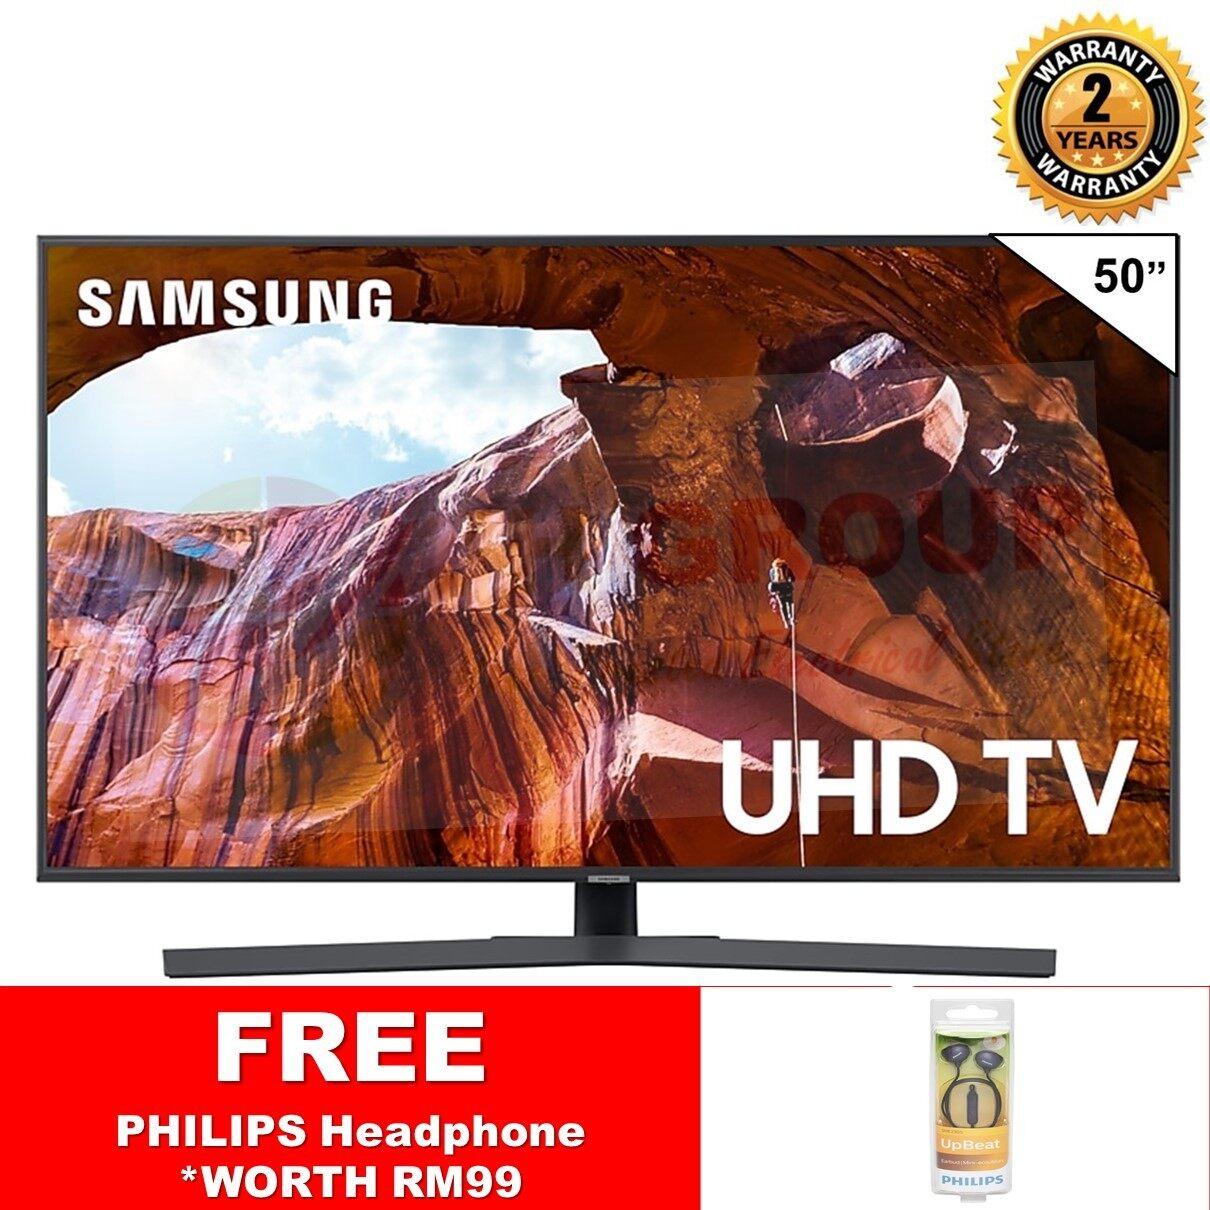 SAMSUNG 50 4K UHD DVB-T2 SMART LED TV DTTV IDTV MYTV MYFREEVIEW SUPPORTED UA50RU7400KXXM / UA50RU7400 *FREE PHILIPS HEADPHONE SHE2305BK